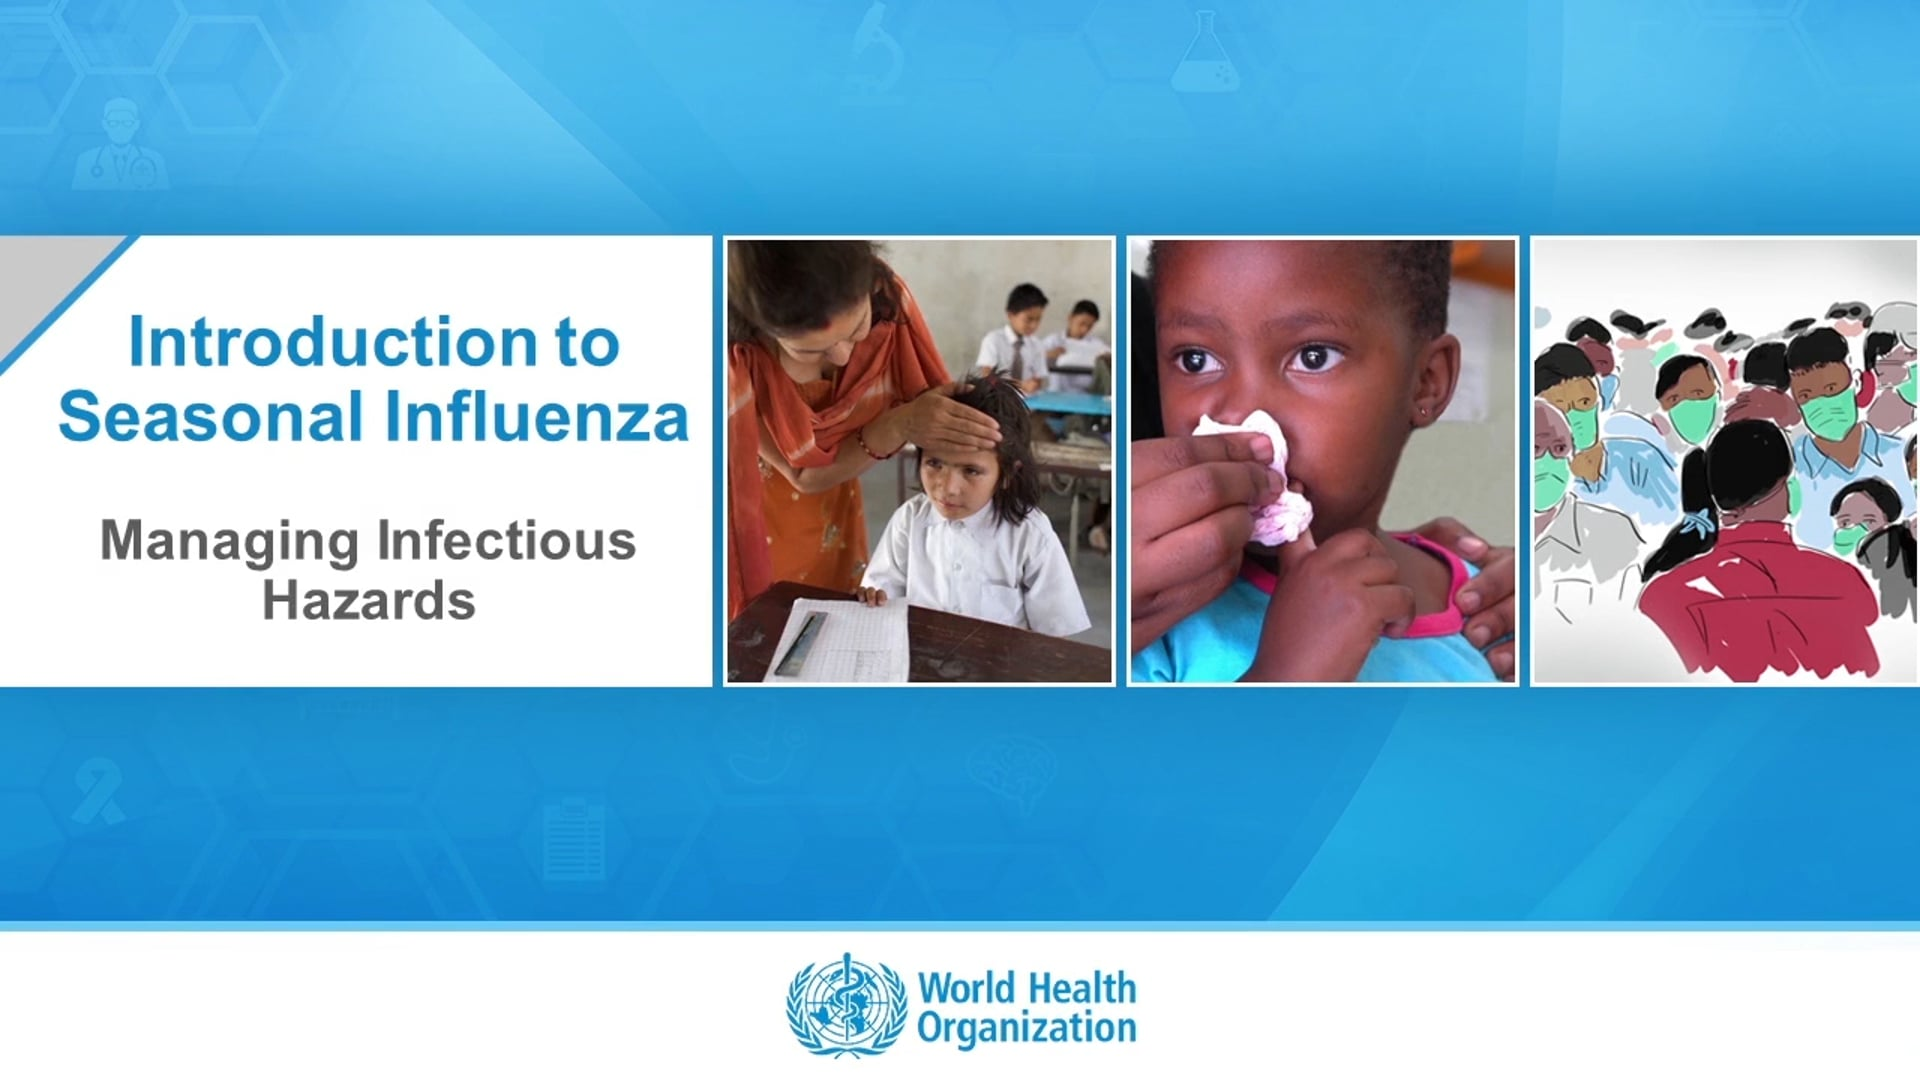 Introduction to Seasonal Influenza